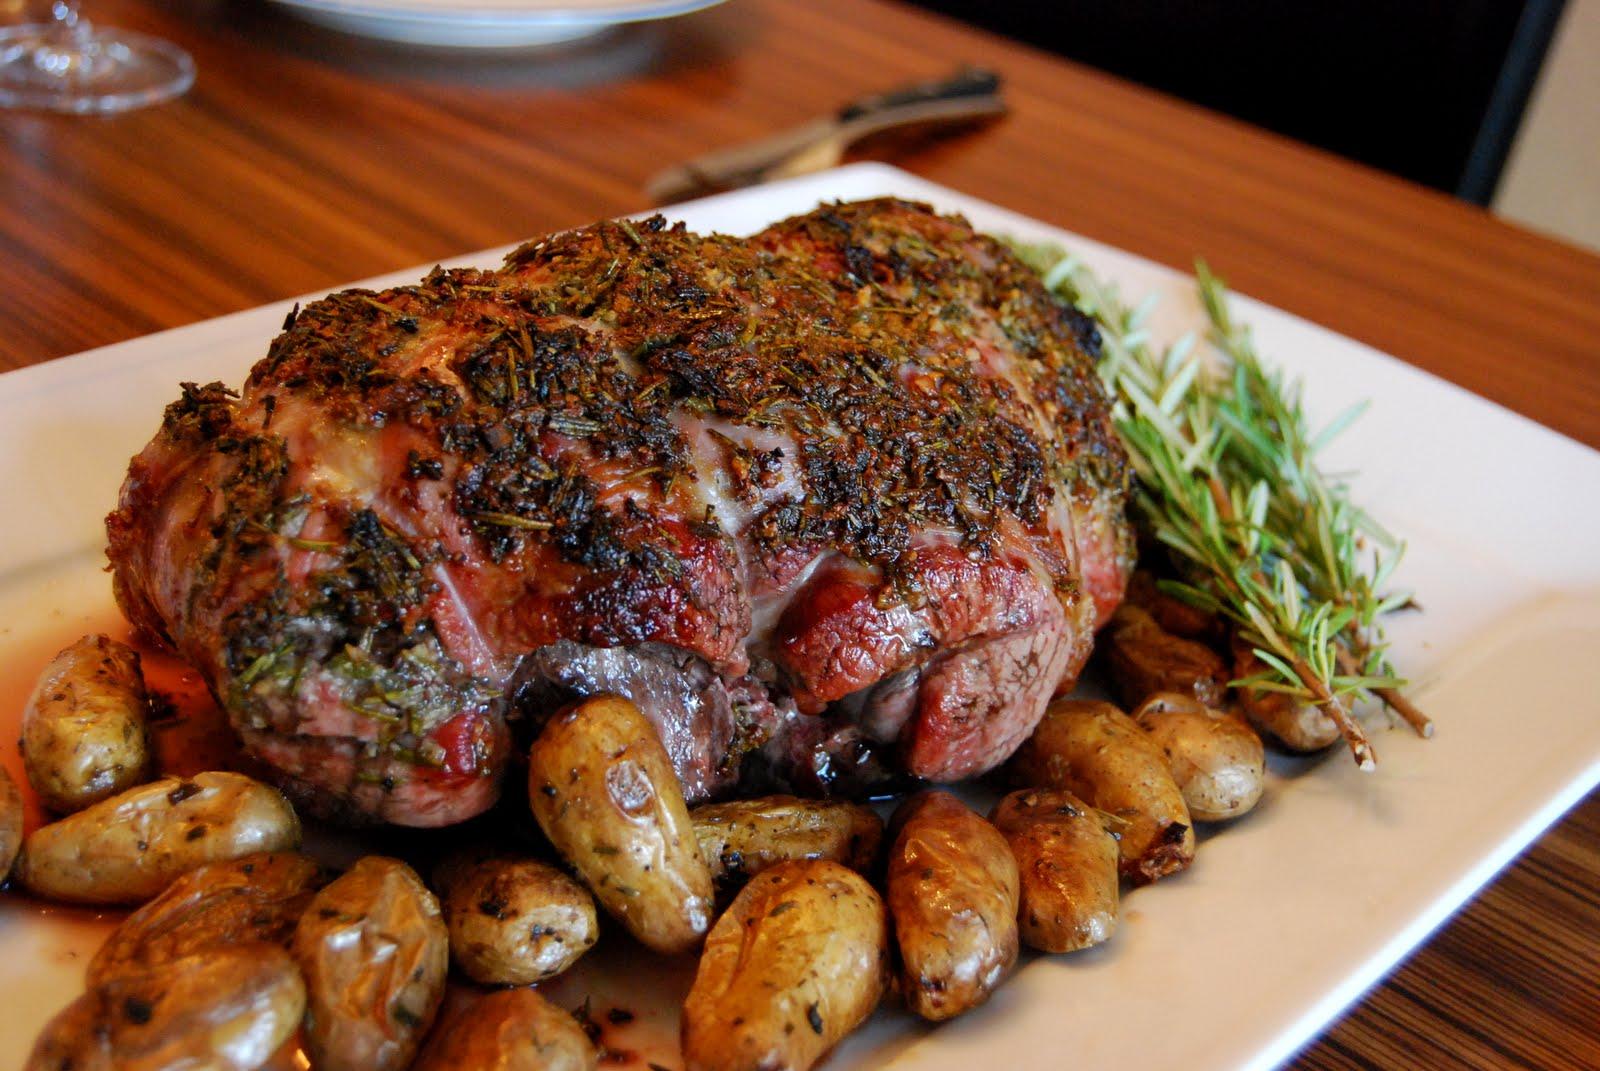 EAT Everyday: An Easter Sunday Dinner